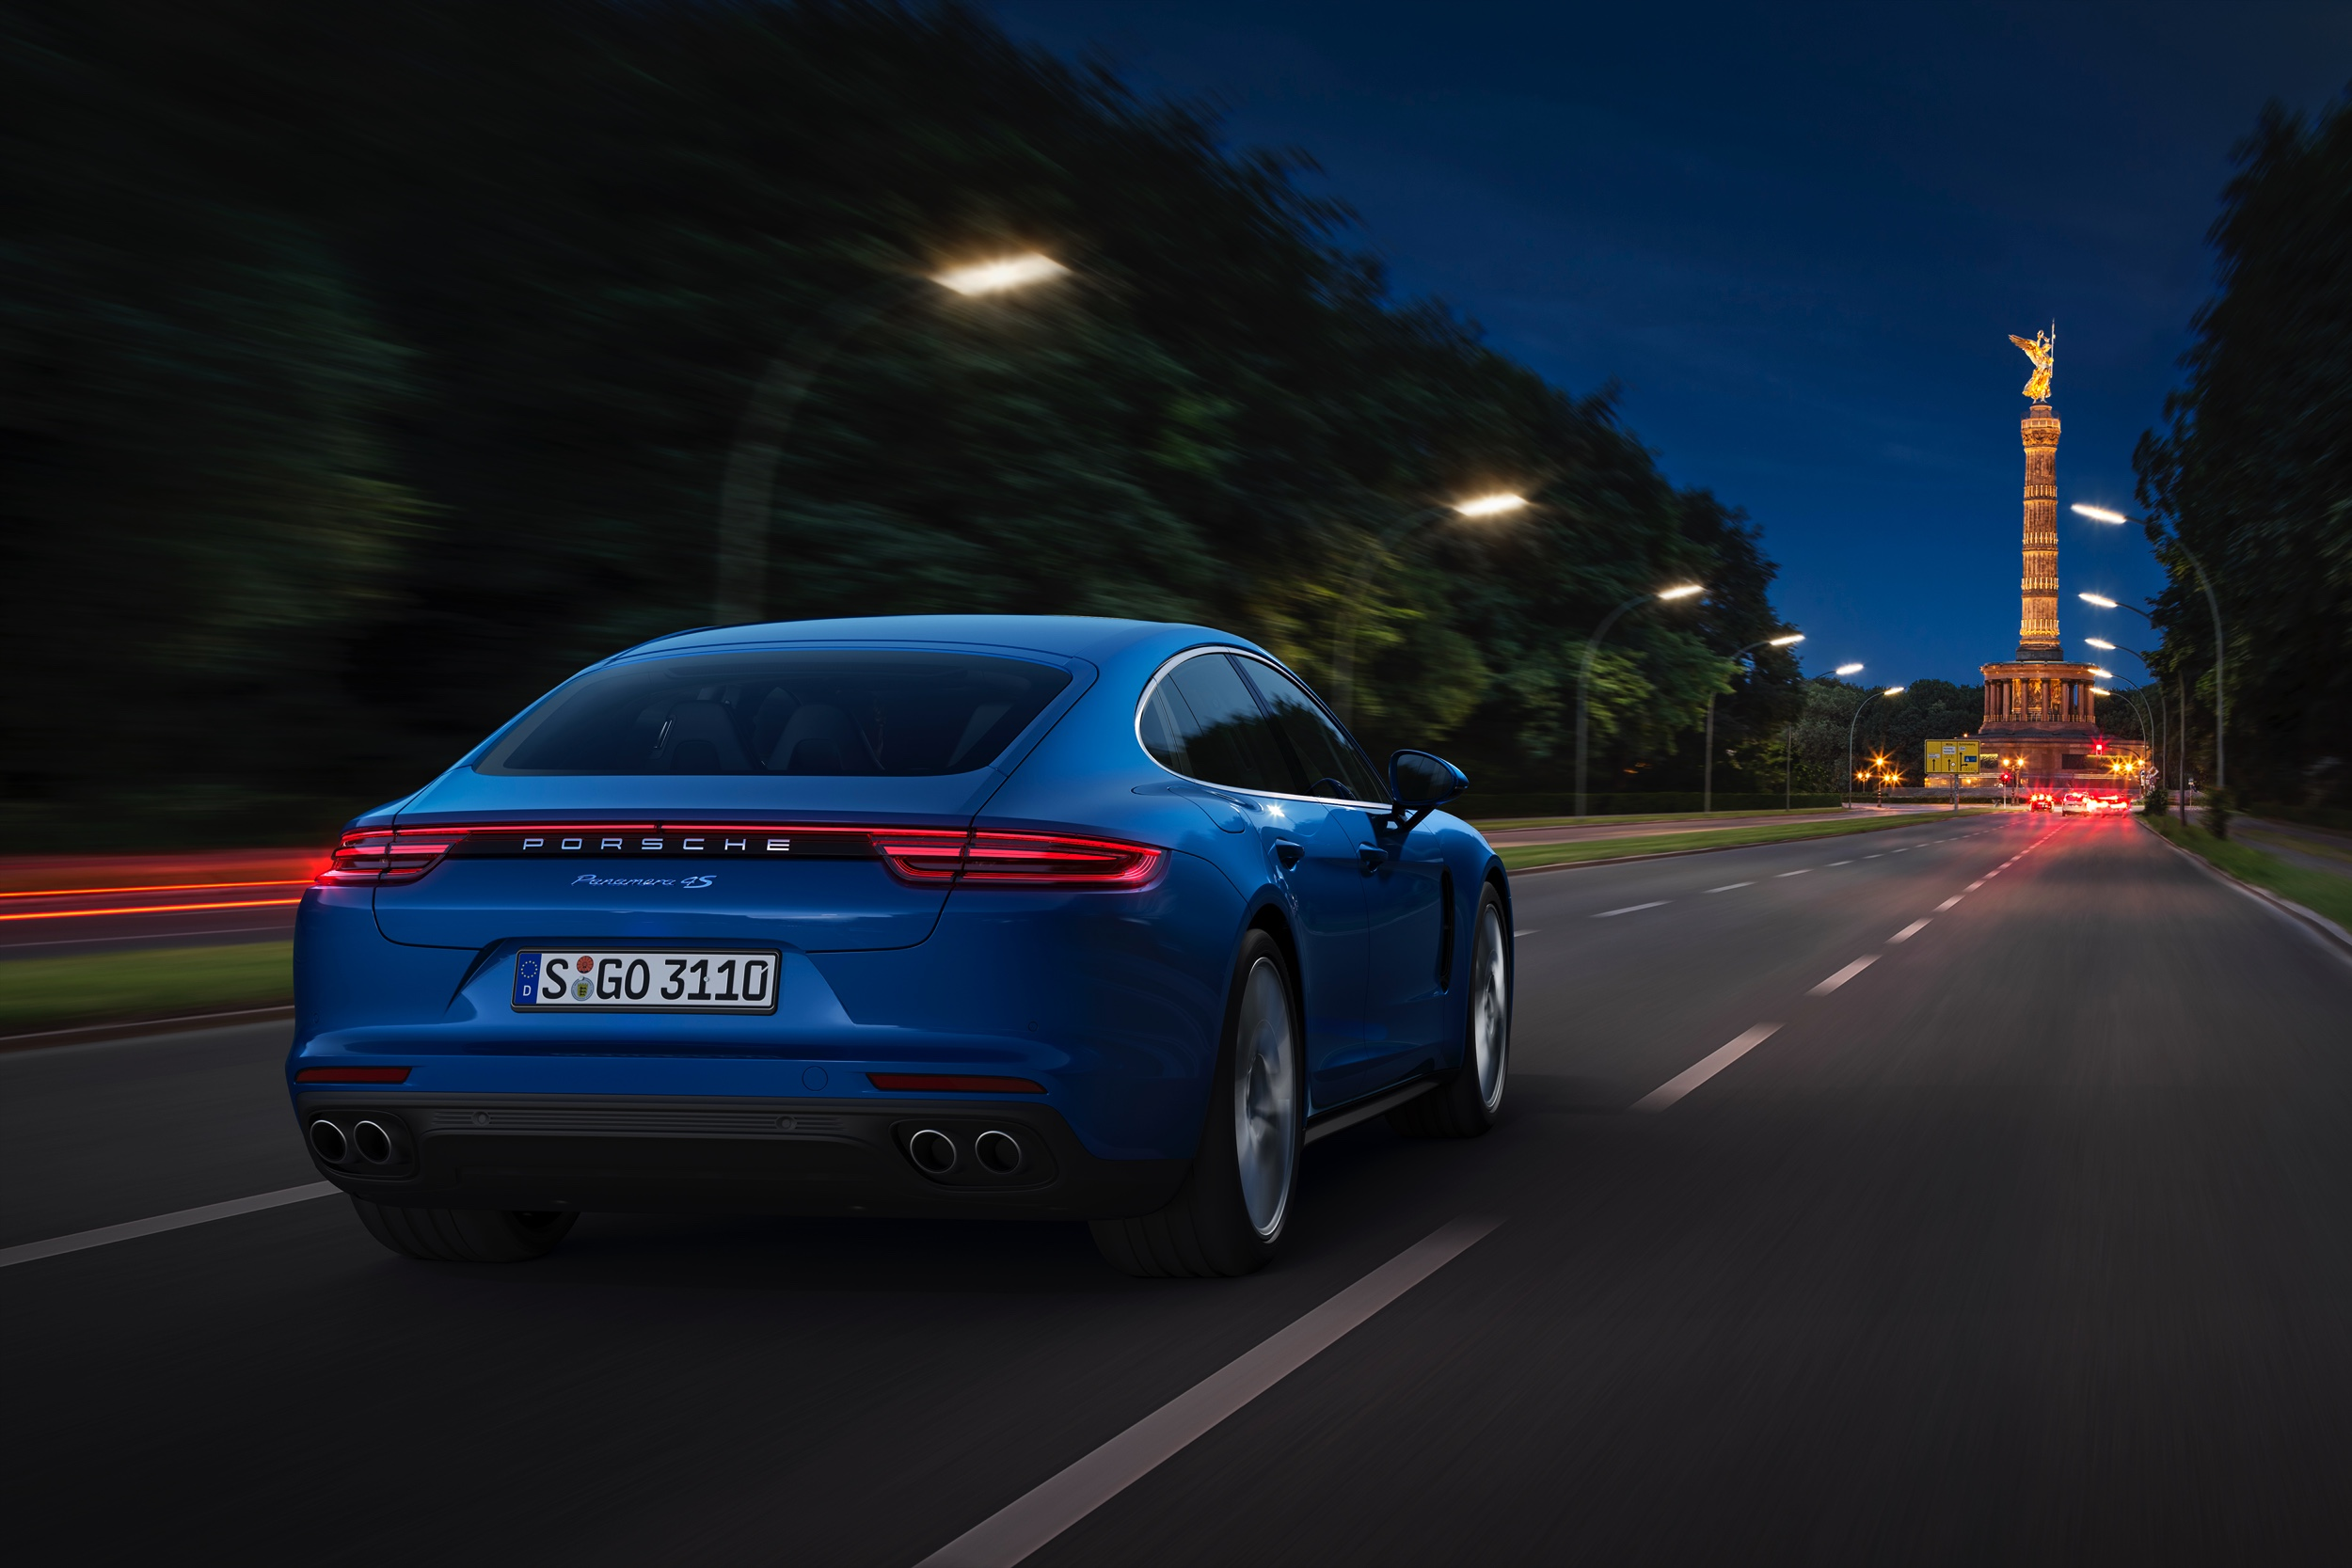 Porsche Panamera - Autovisie.nl - 1